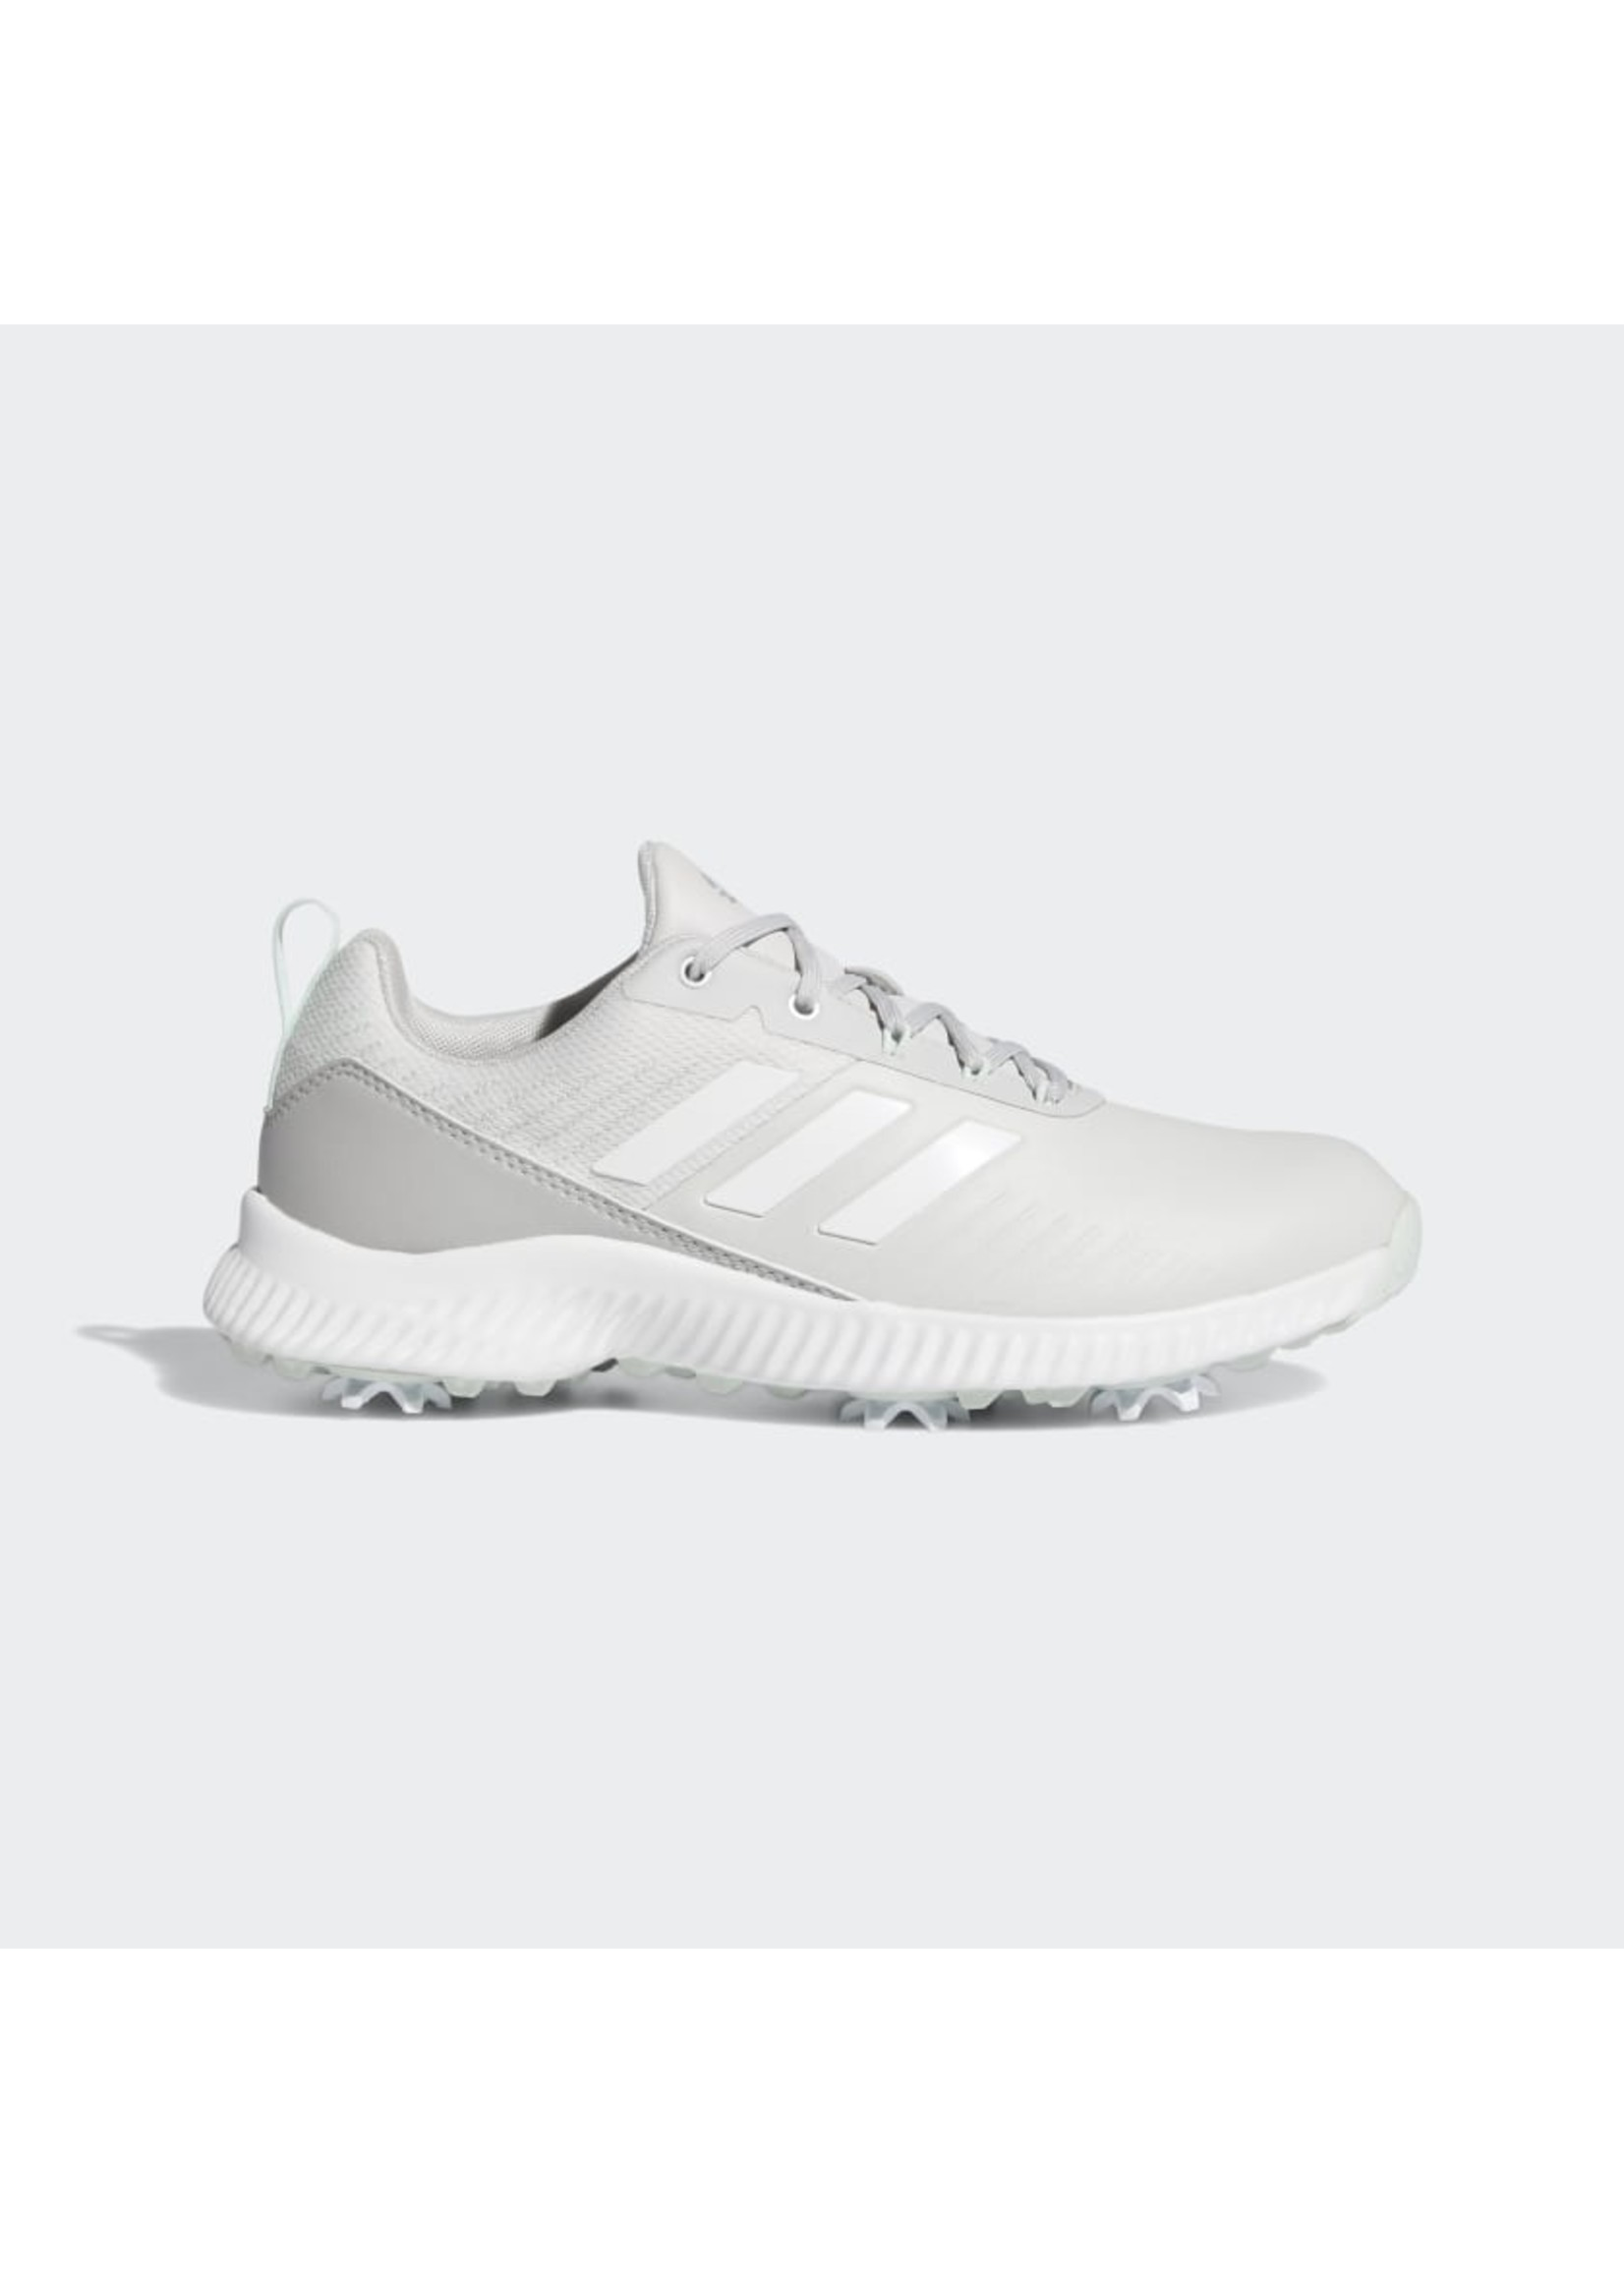 Adidas Adidas Response Bounce 2.0 Ladies Golf Shoe (2020)